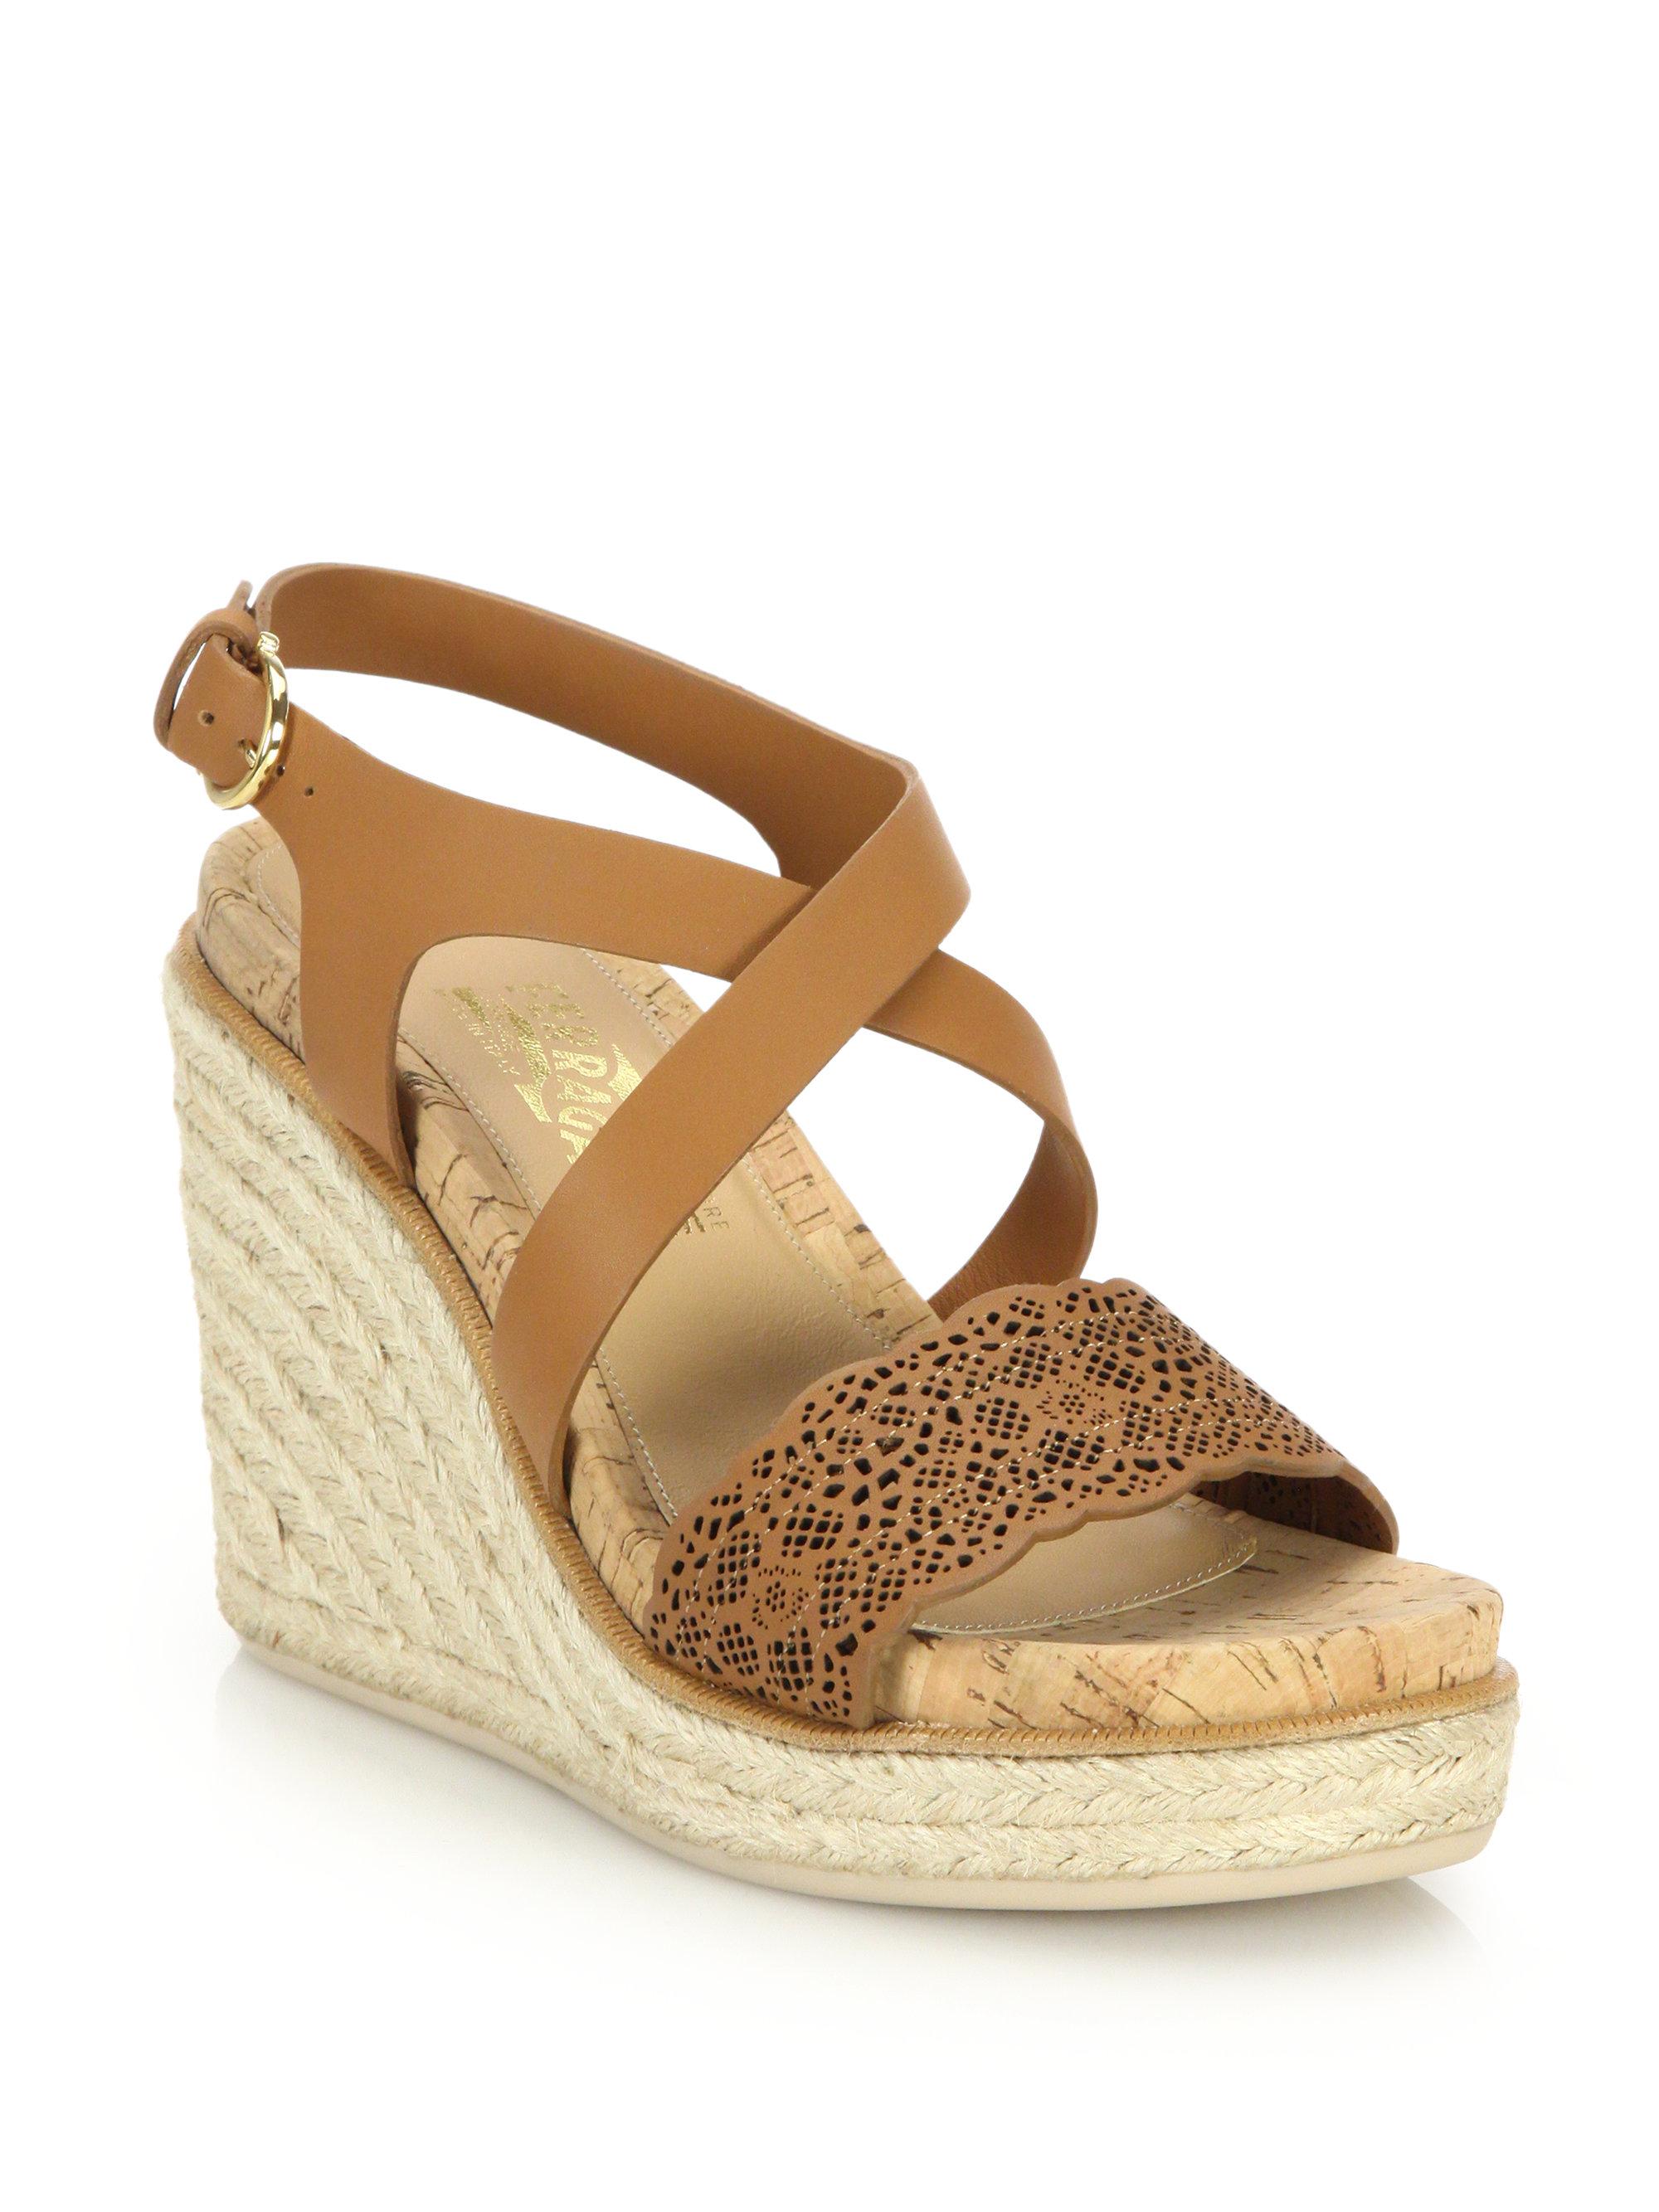 Ferragamo Gioela Raffia Amp Leather Platform Wedge Sandals